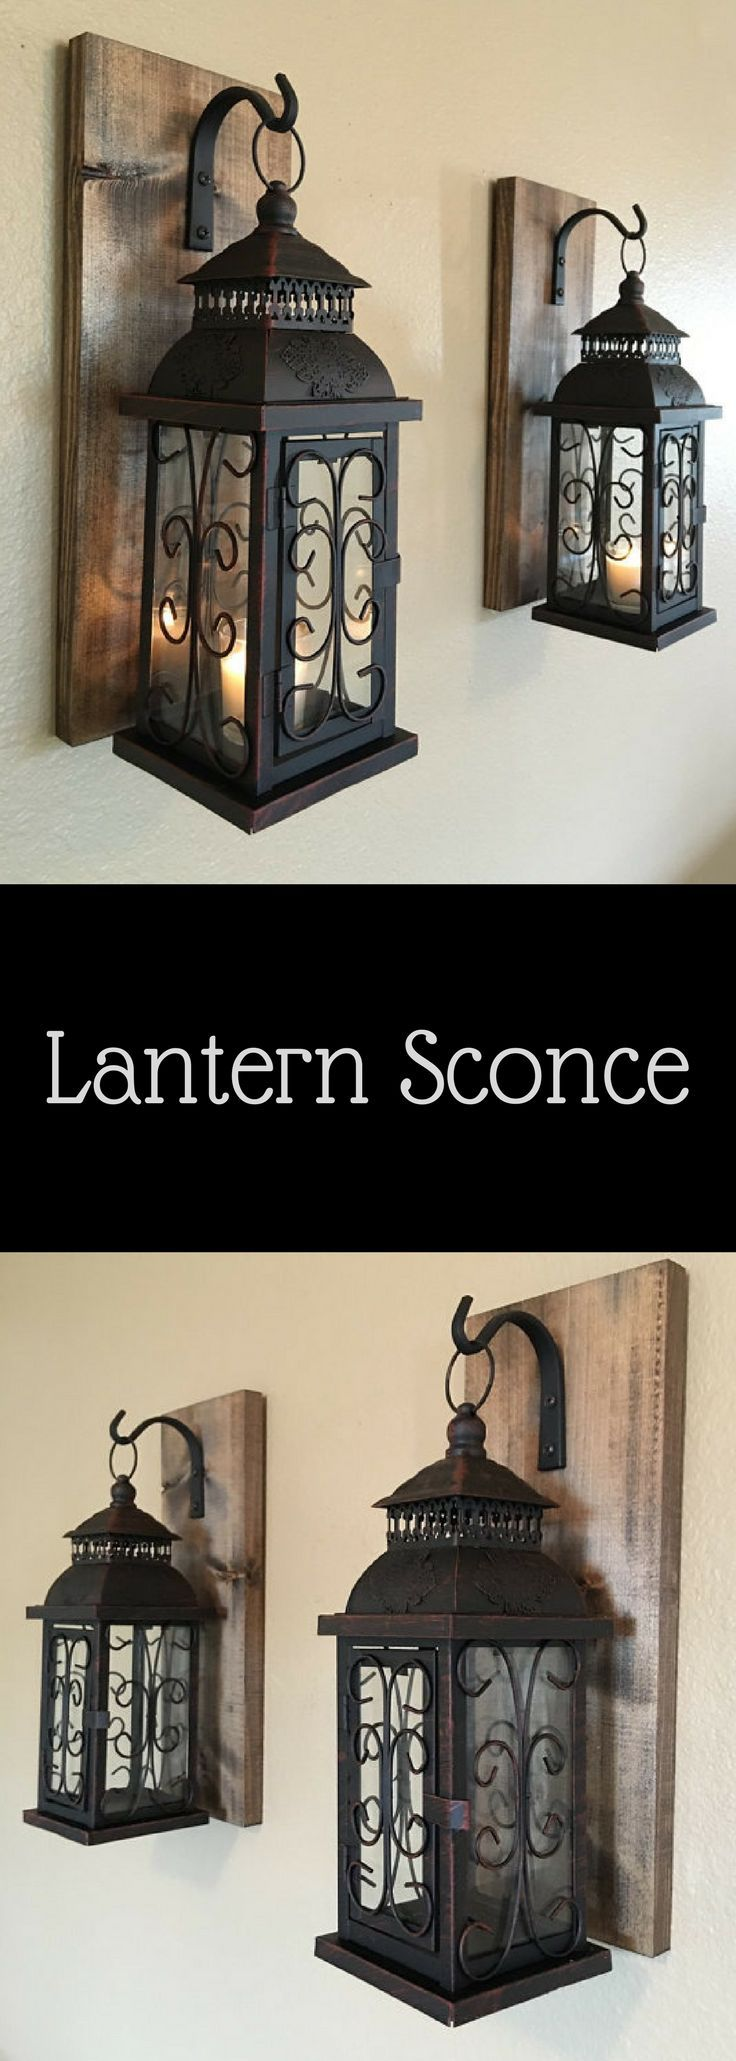 Lantern pair wall decor wall sconces bathroom decor home and